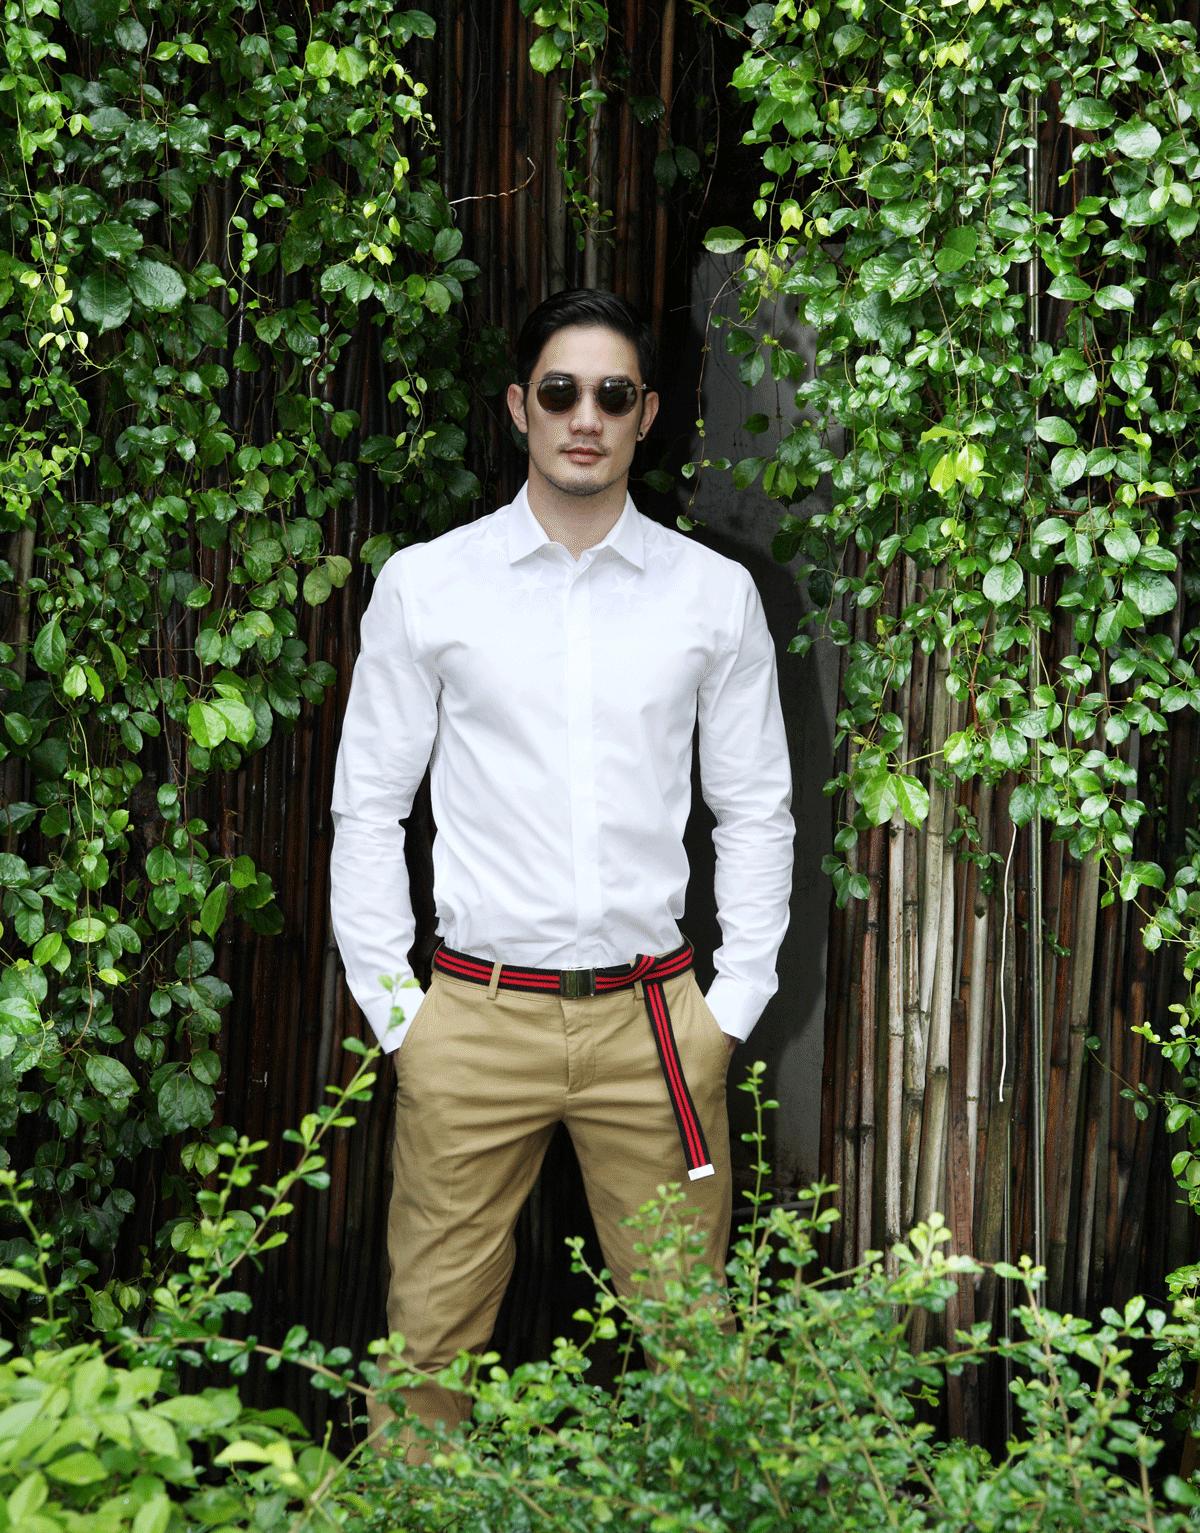 shirt : GIVENCHY / pants : JBB* / sunglasses : TAVAT